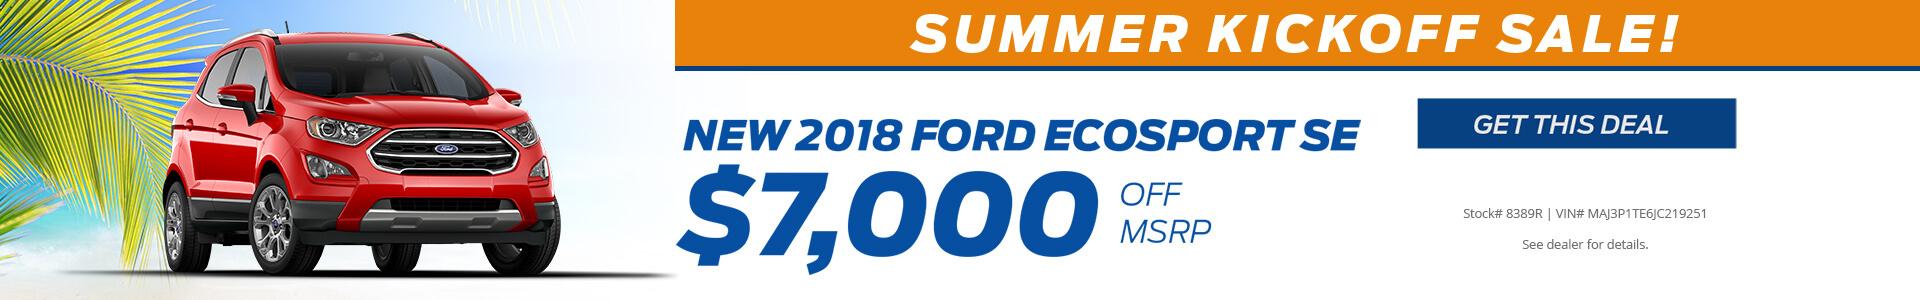 Ecosport $7000 off MSRP